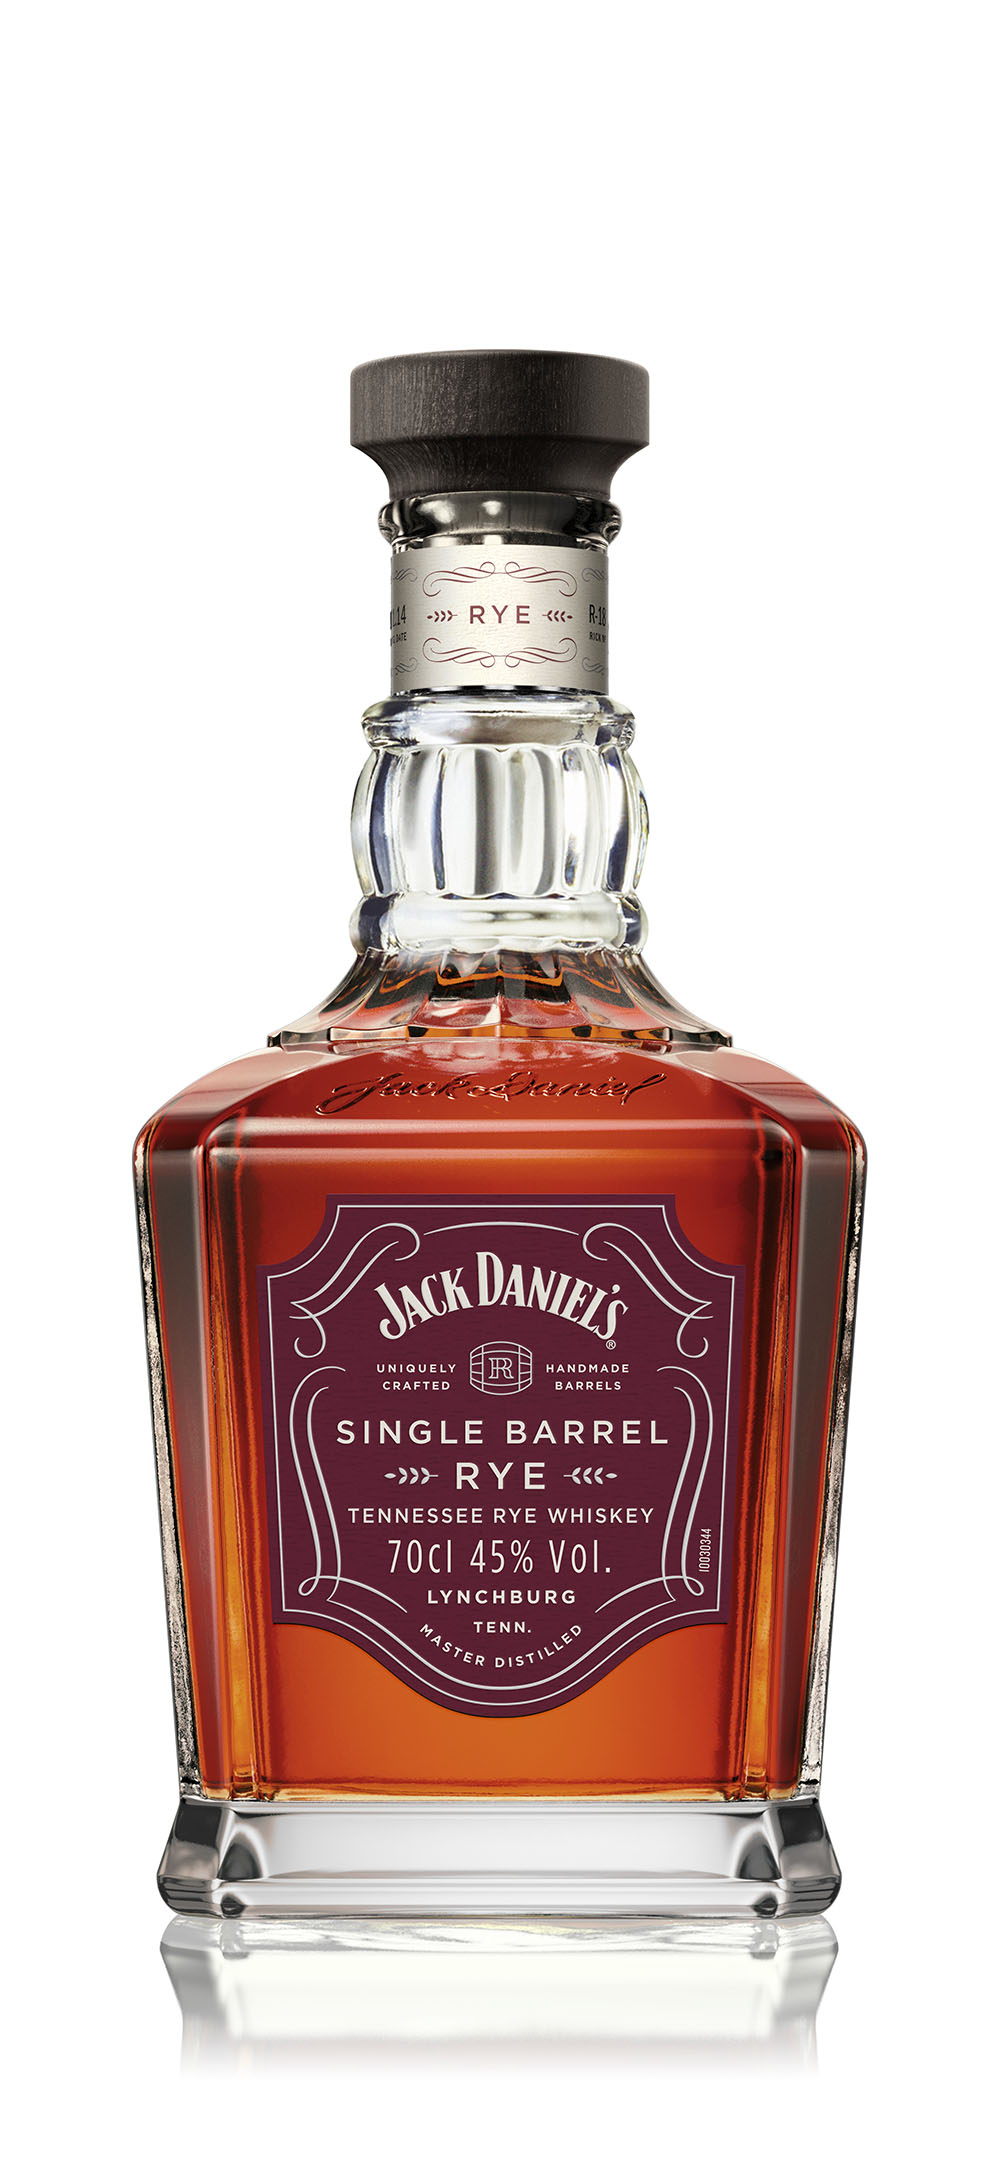 225366_2016_JDSB_Rye_70cl_Bottle Shot_White Background_AdditionalFile[1]